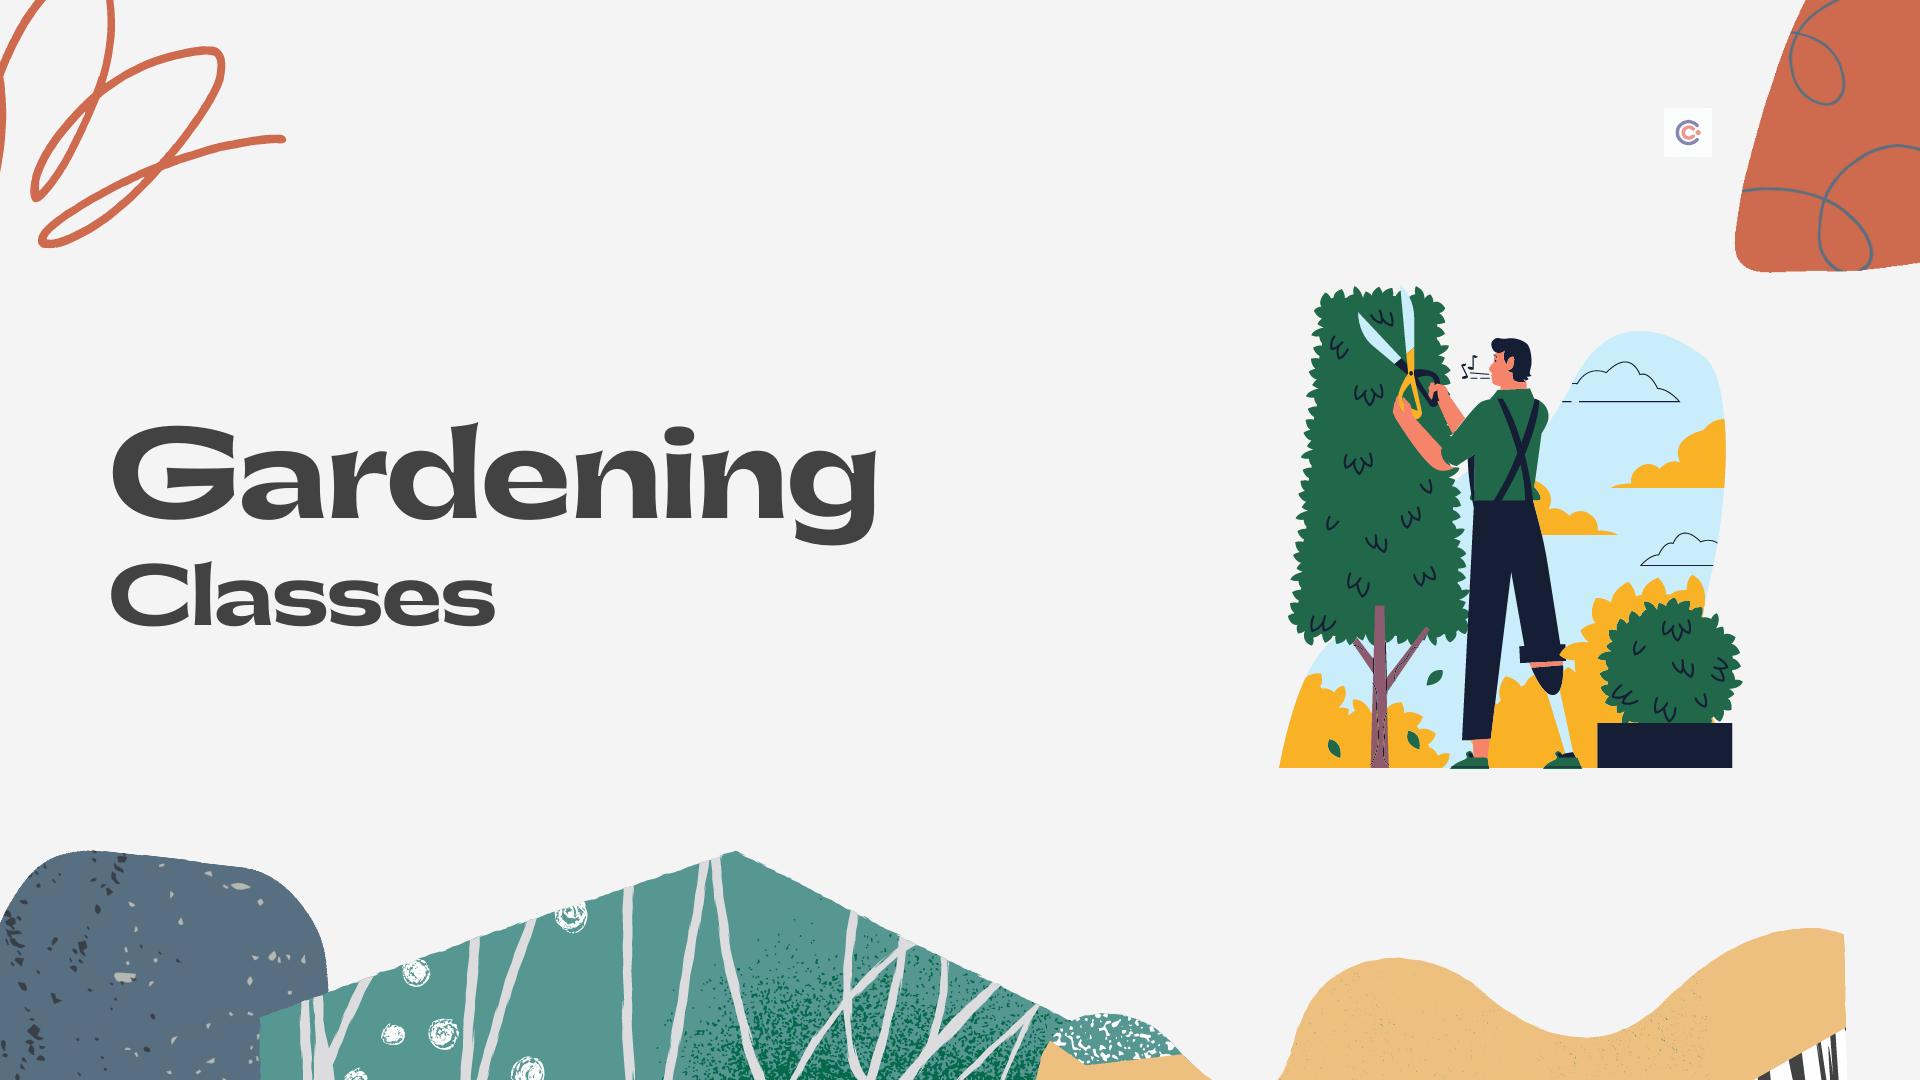 6 Best Gardening Classes - Learn Gardening Online